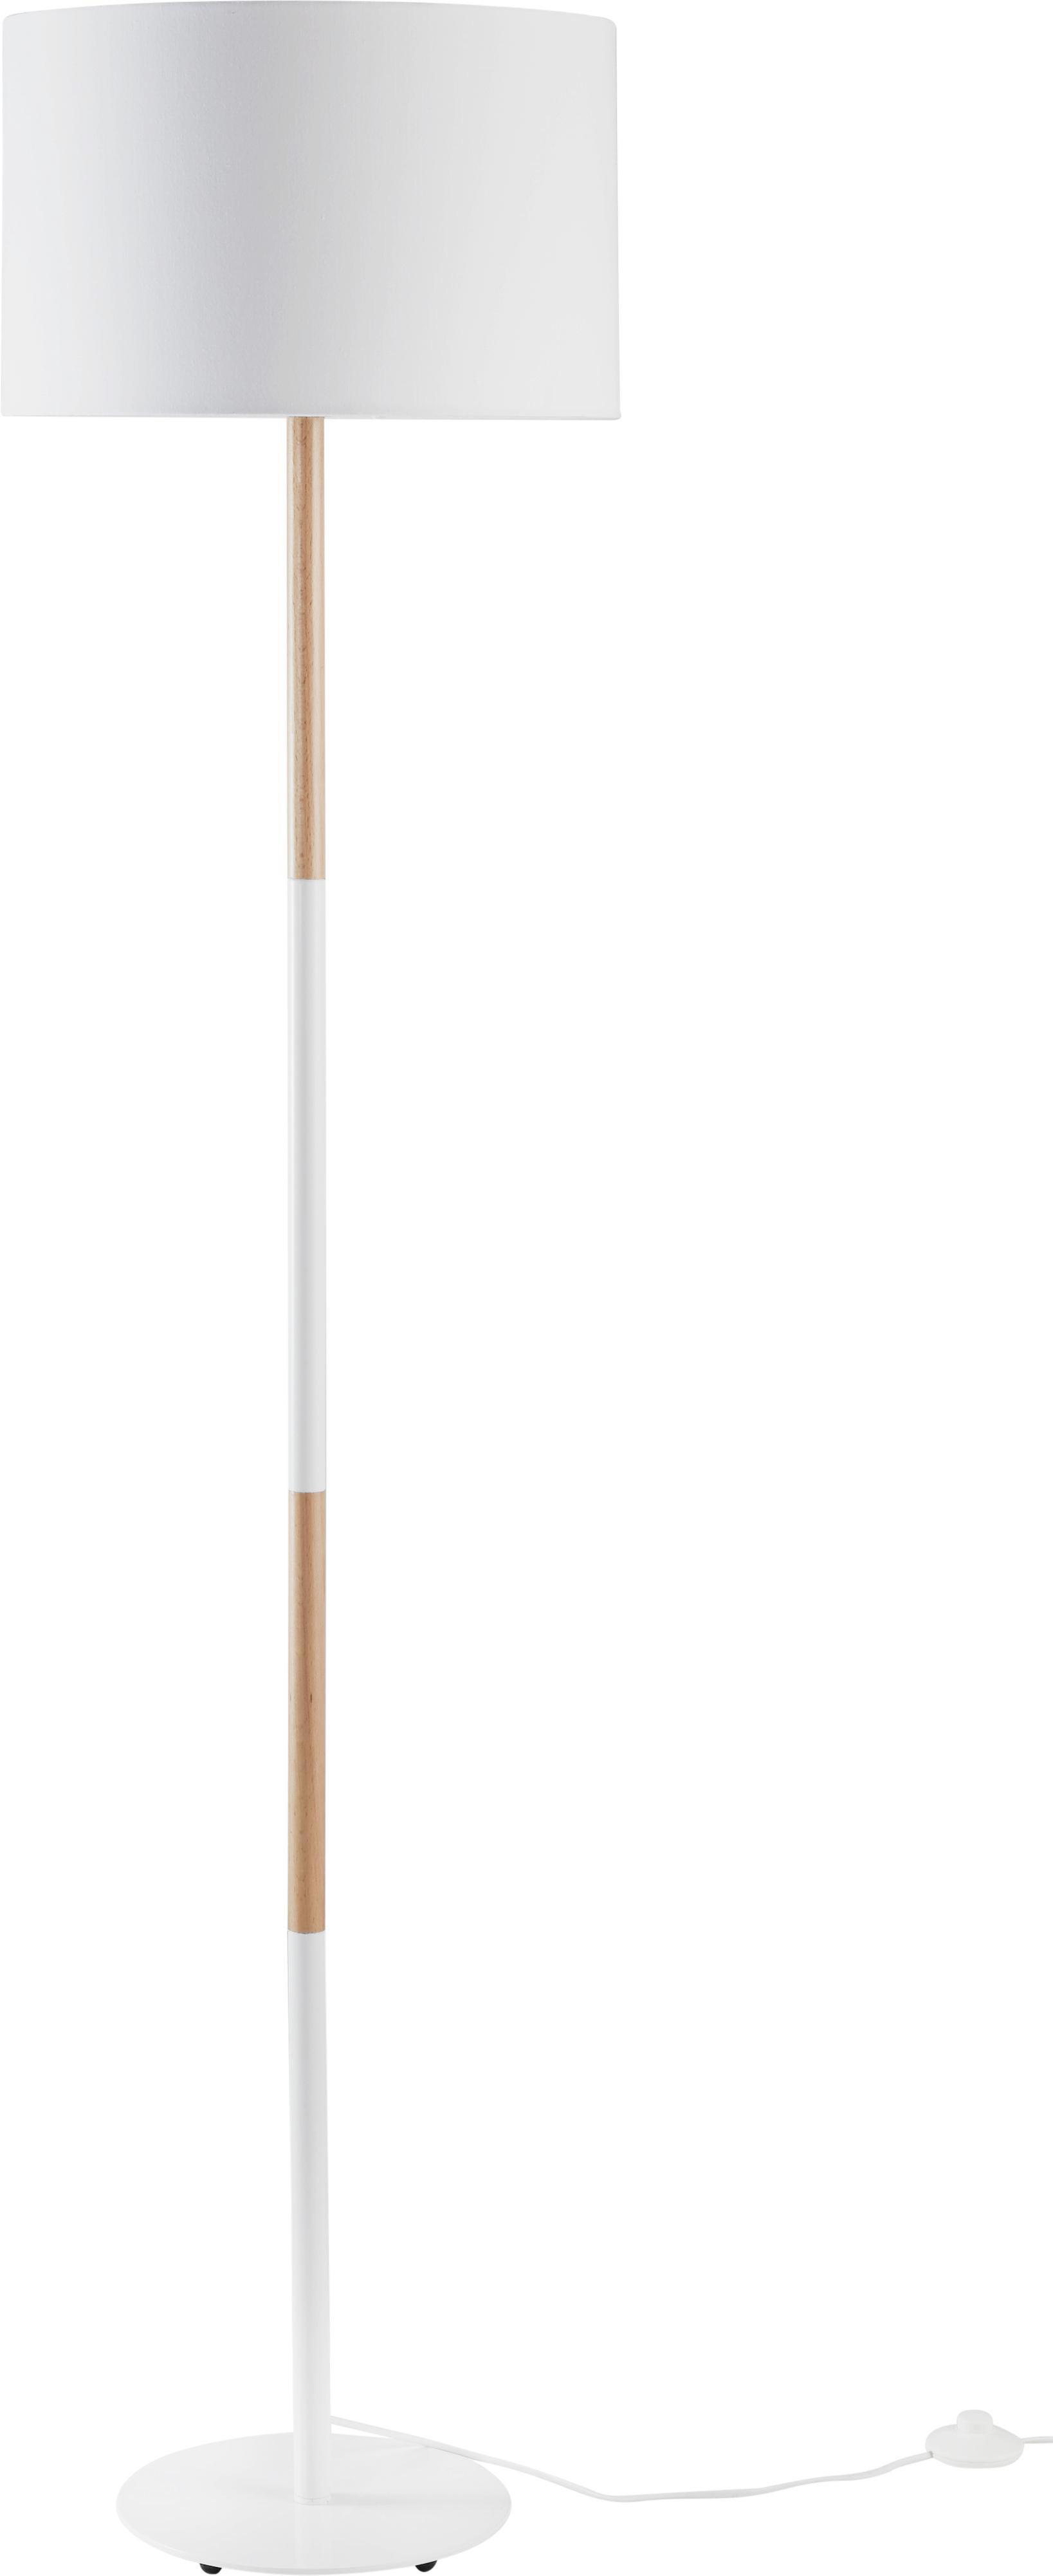 Stehleuchte Allanah - MODERN, Holz/Metall (40/167,2cm) - MÖMAX modern living